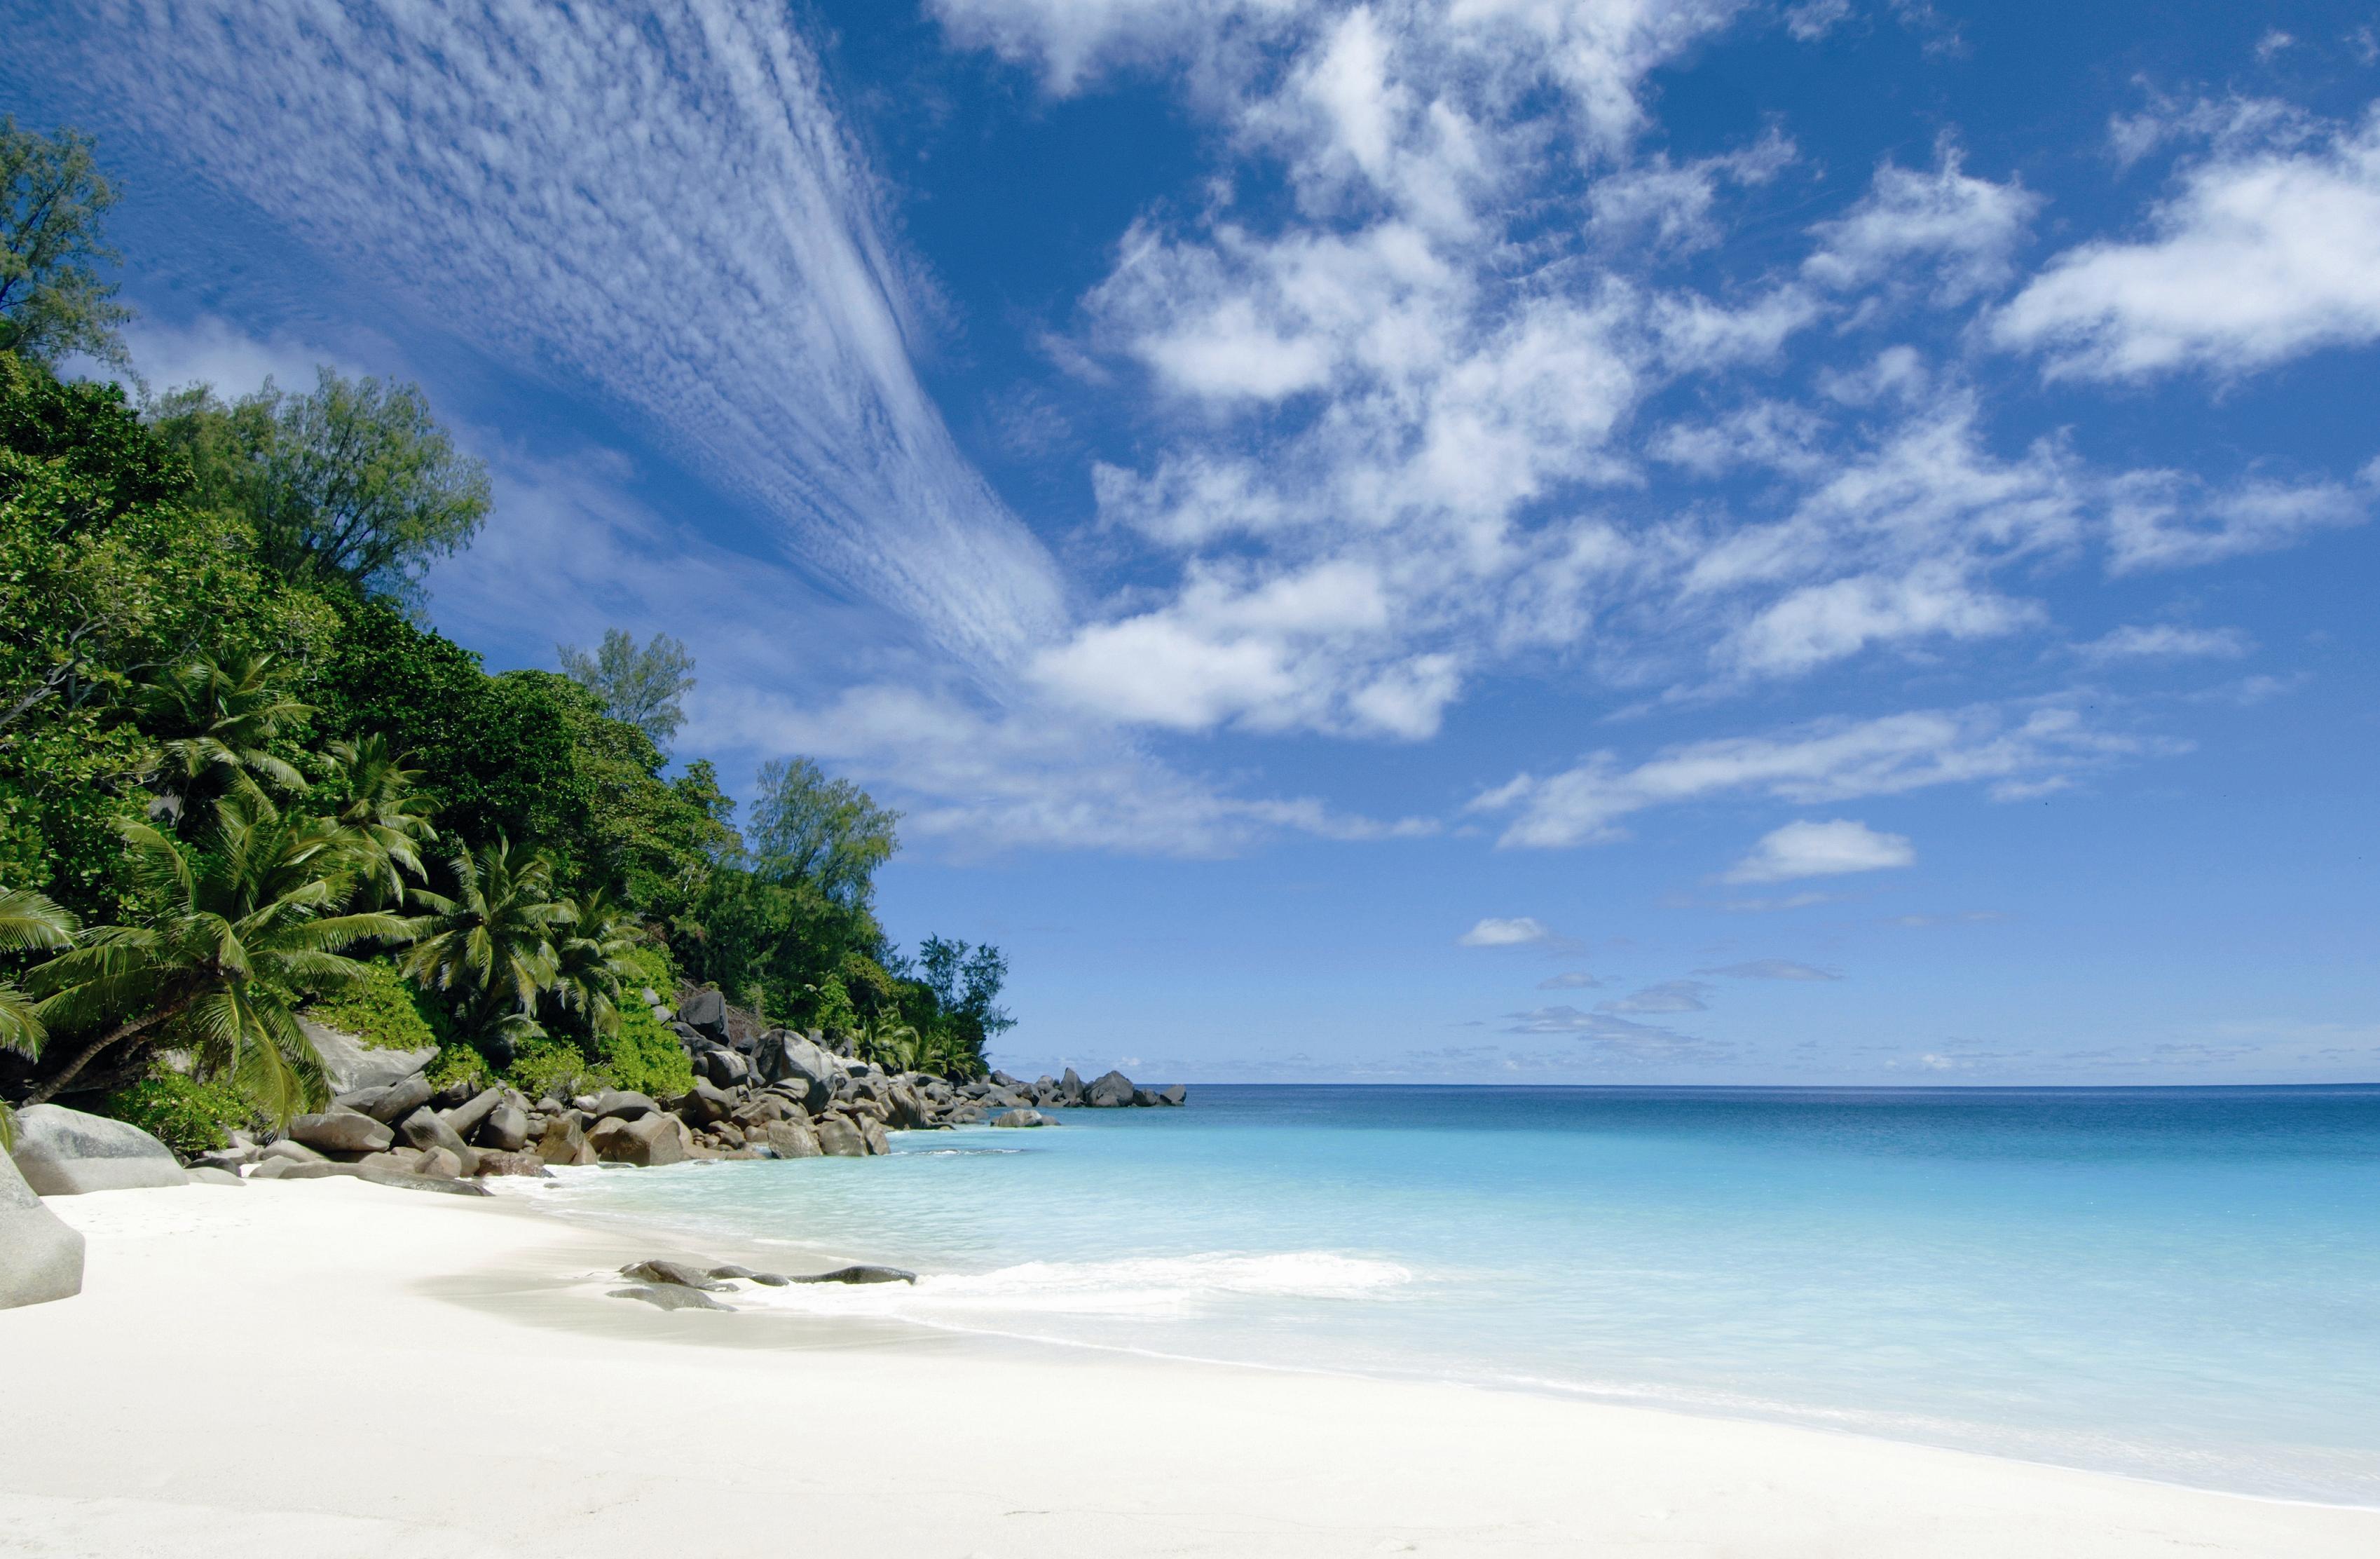 flittern a la carte paradiesischer honeymoon auf den malediven. Black Bedroom Furniture Sets. Home Design Ideas